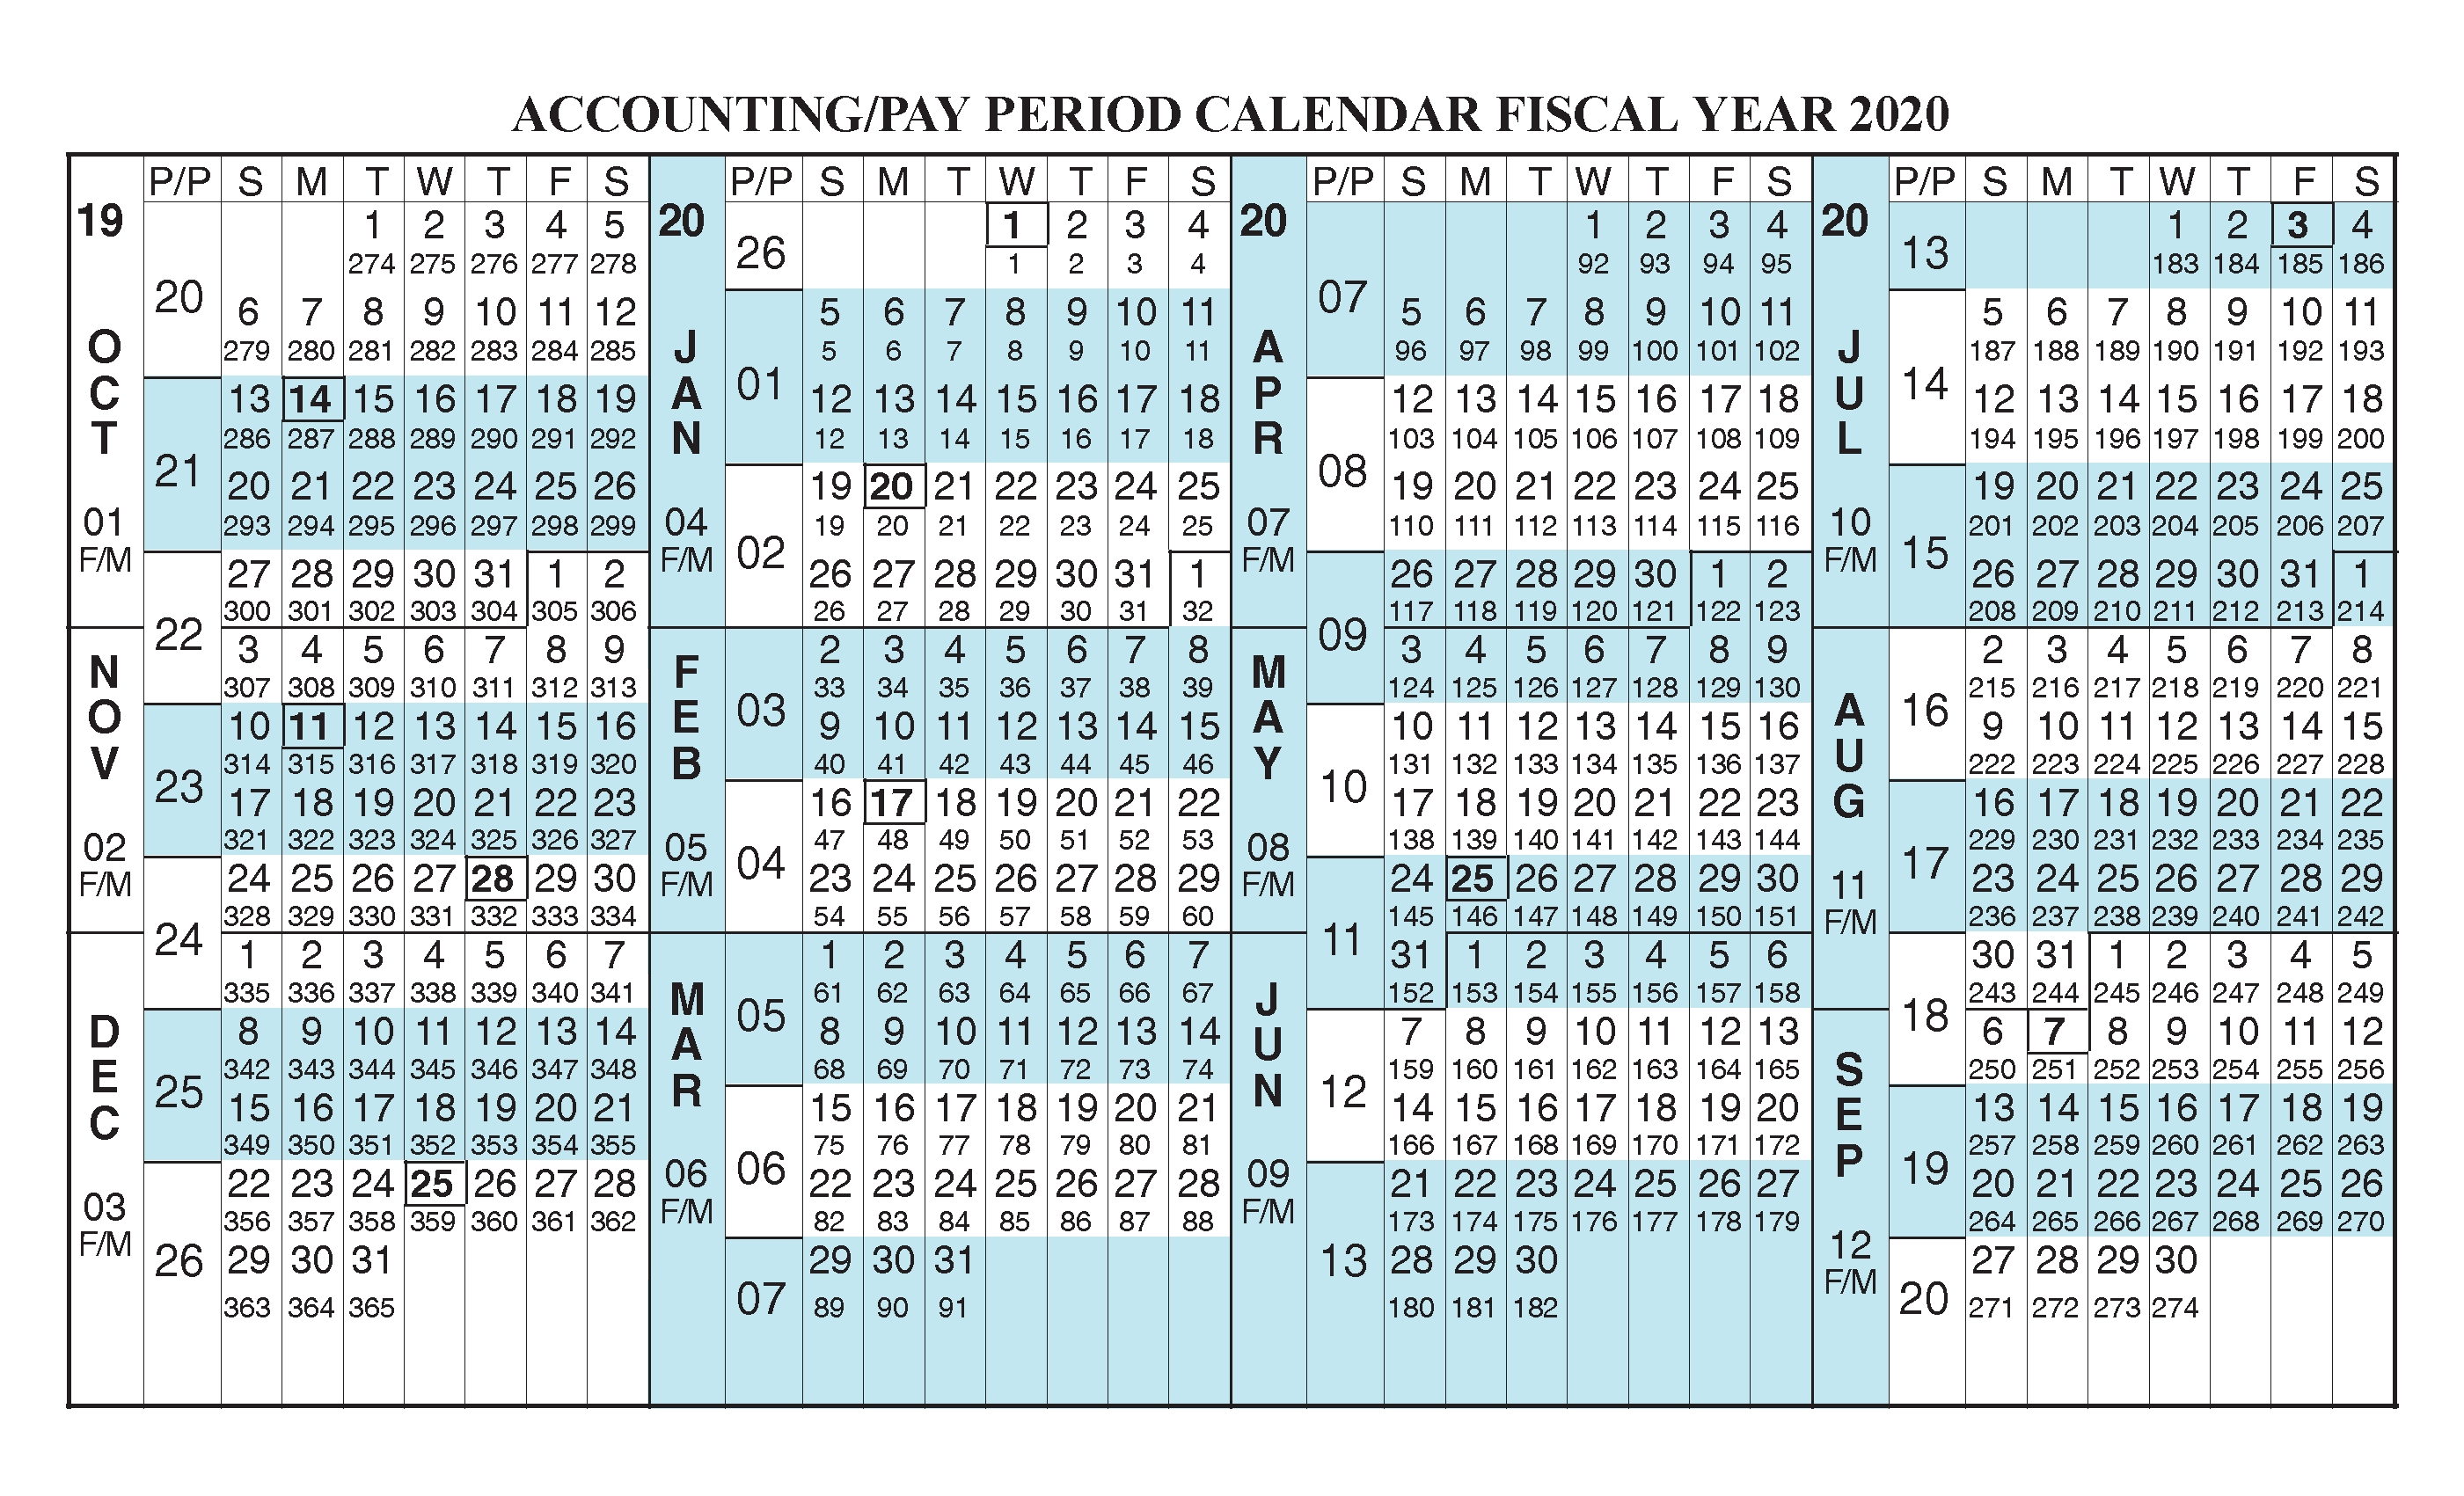 Payroll Calendar 2020 Fiscal Year Calendar [ Oct 2019 - Sep for 2020 Federal Pay Period Calendar Printable